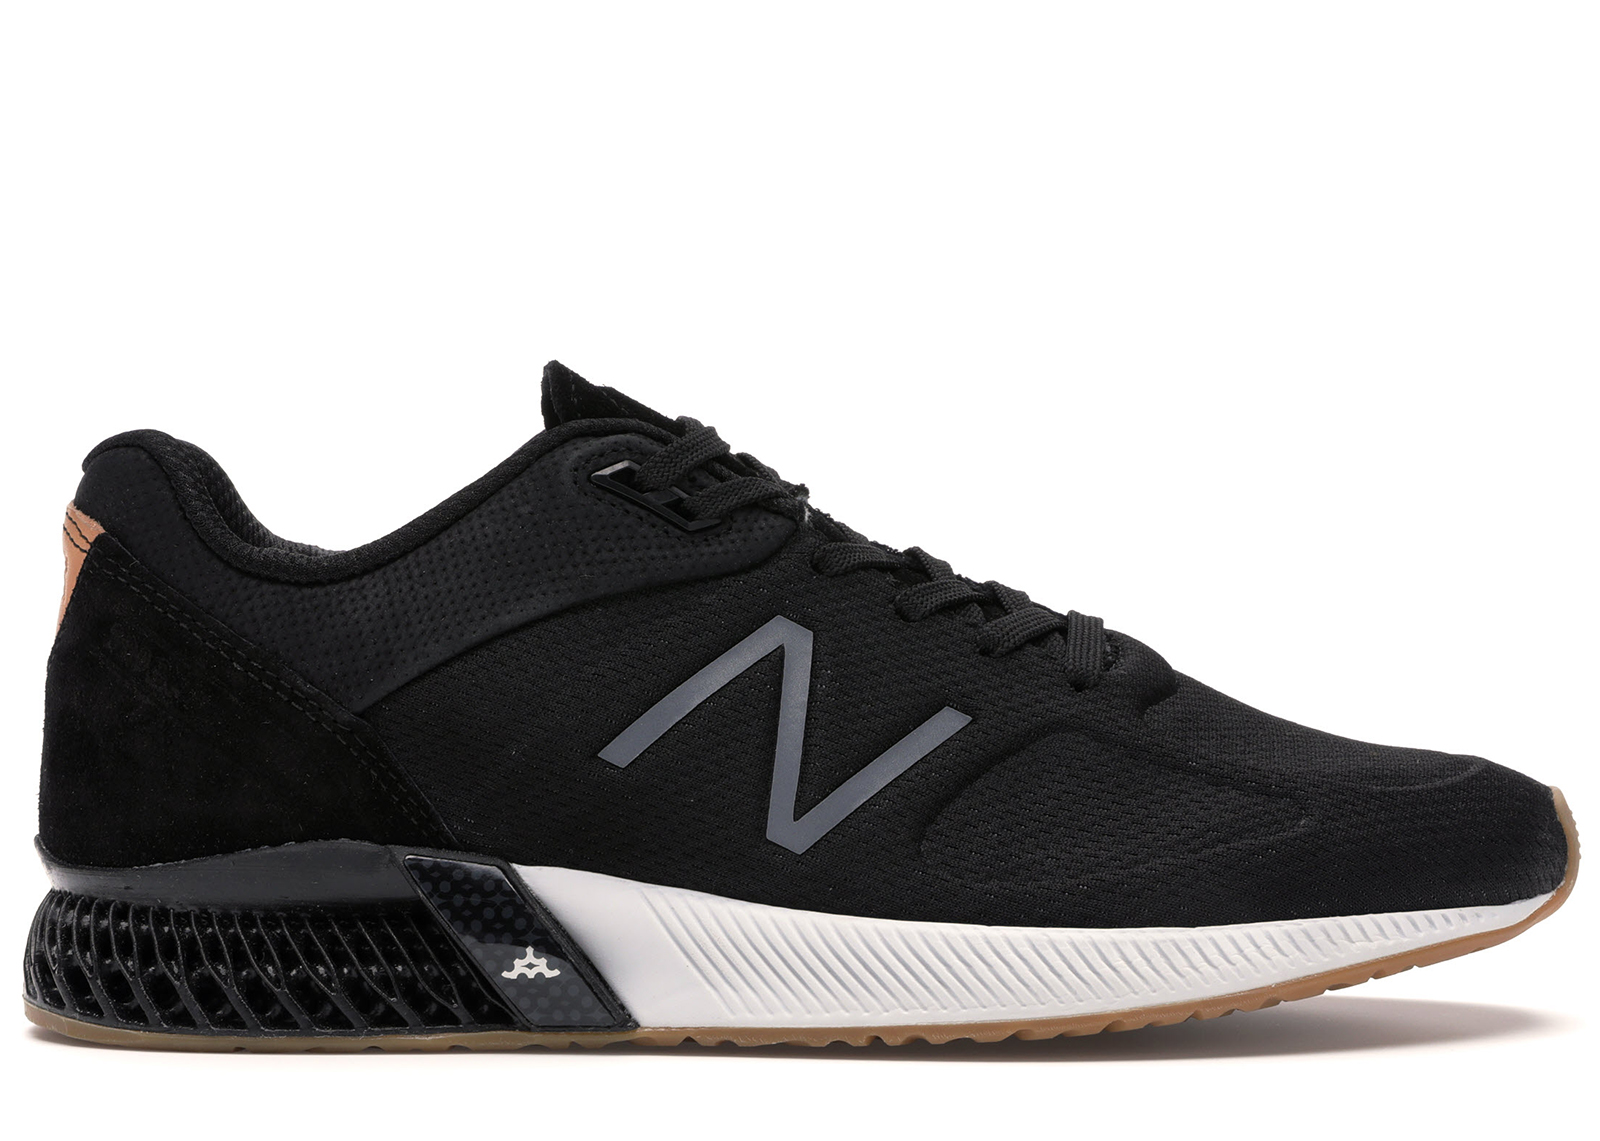 New Balance 990 Sport TripleCell Black